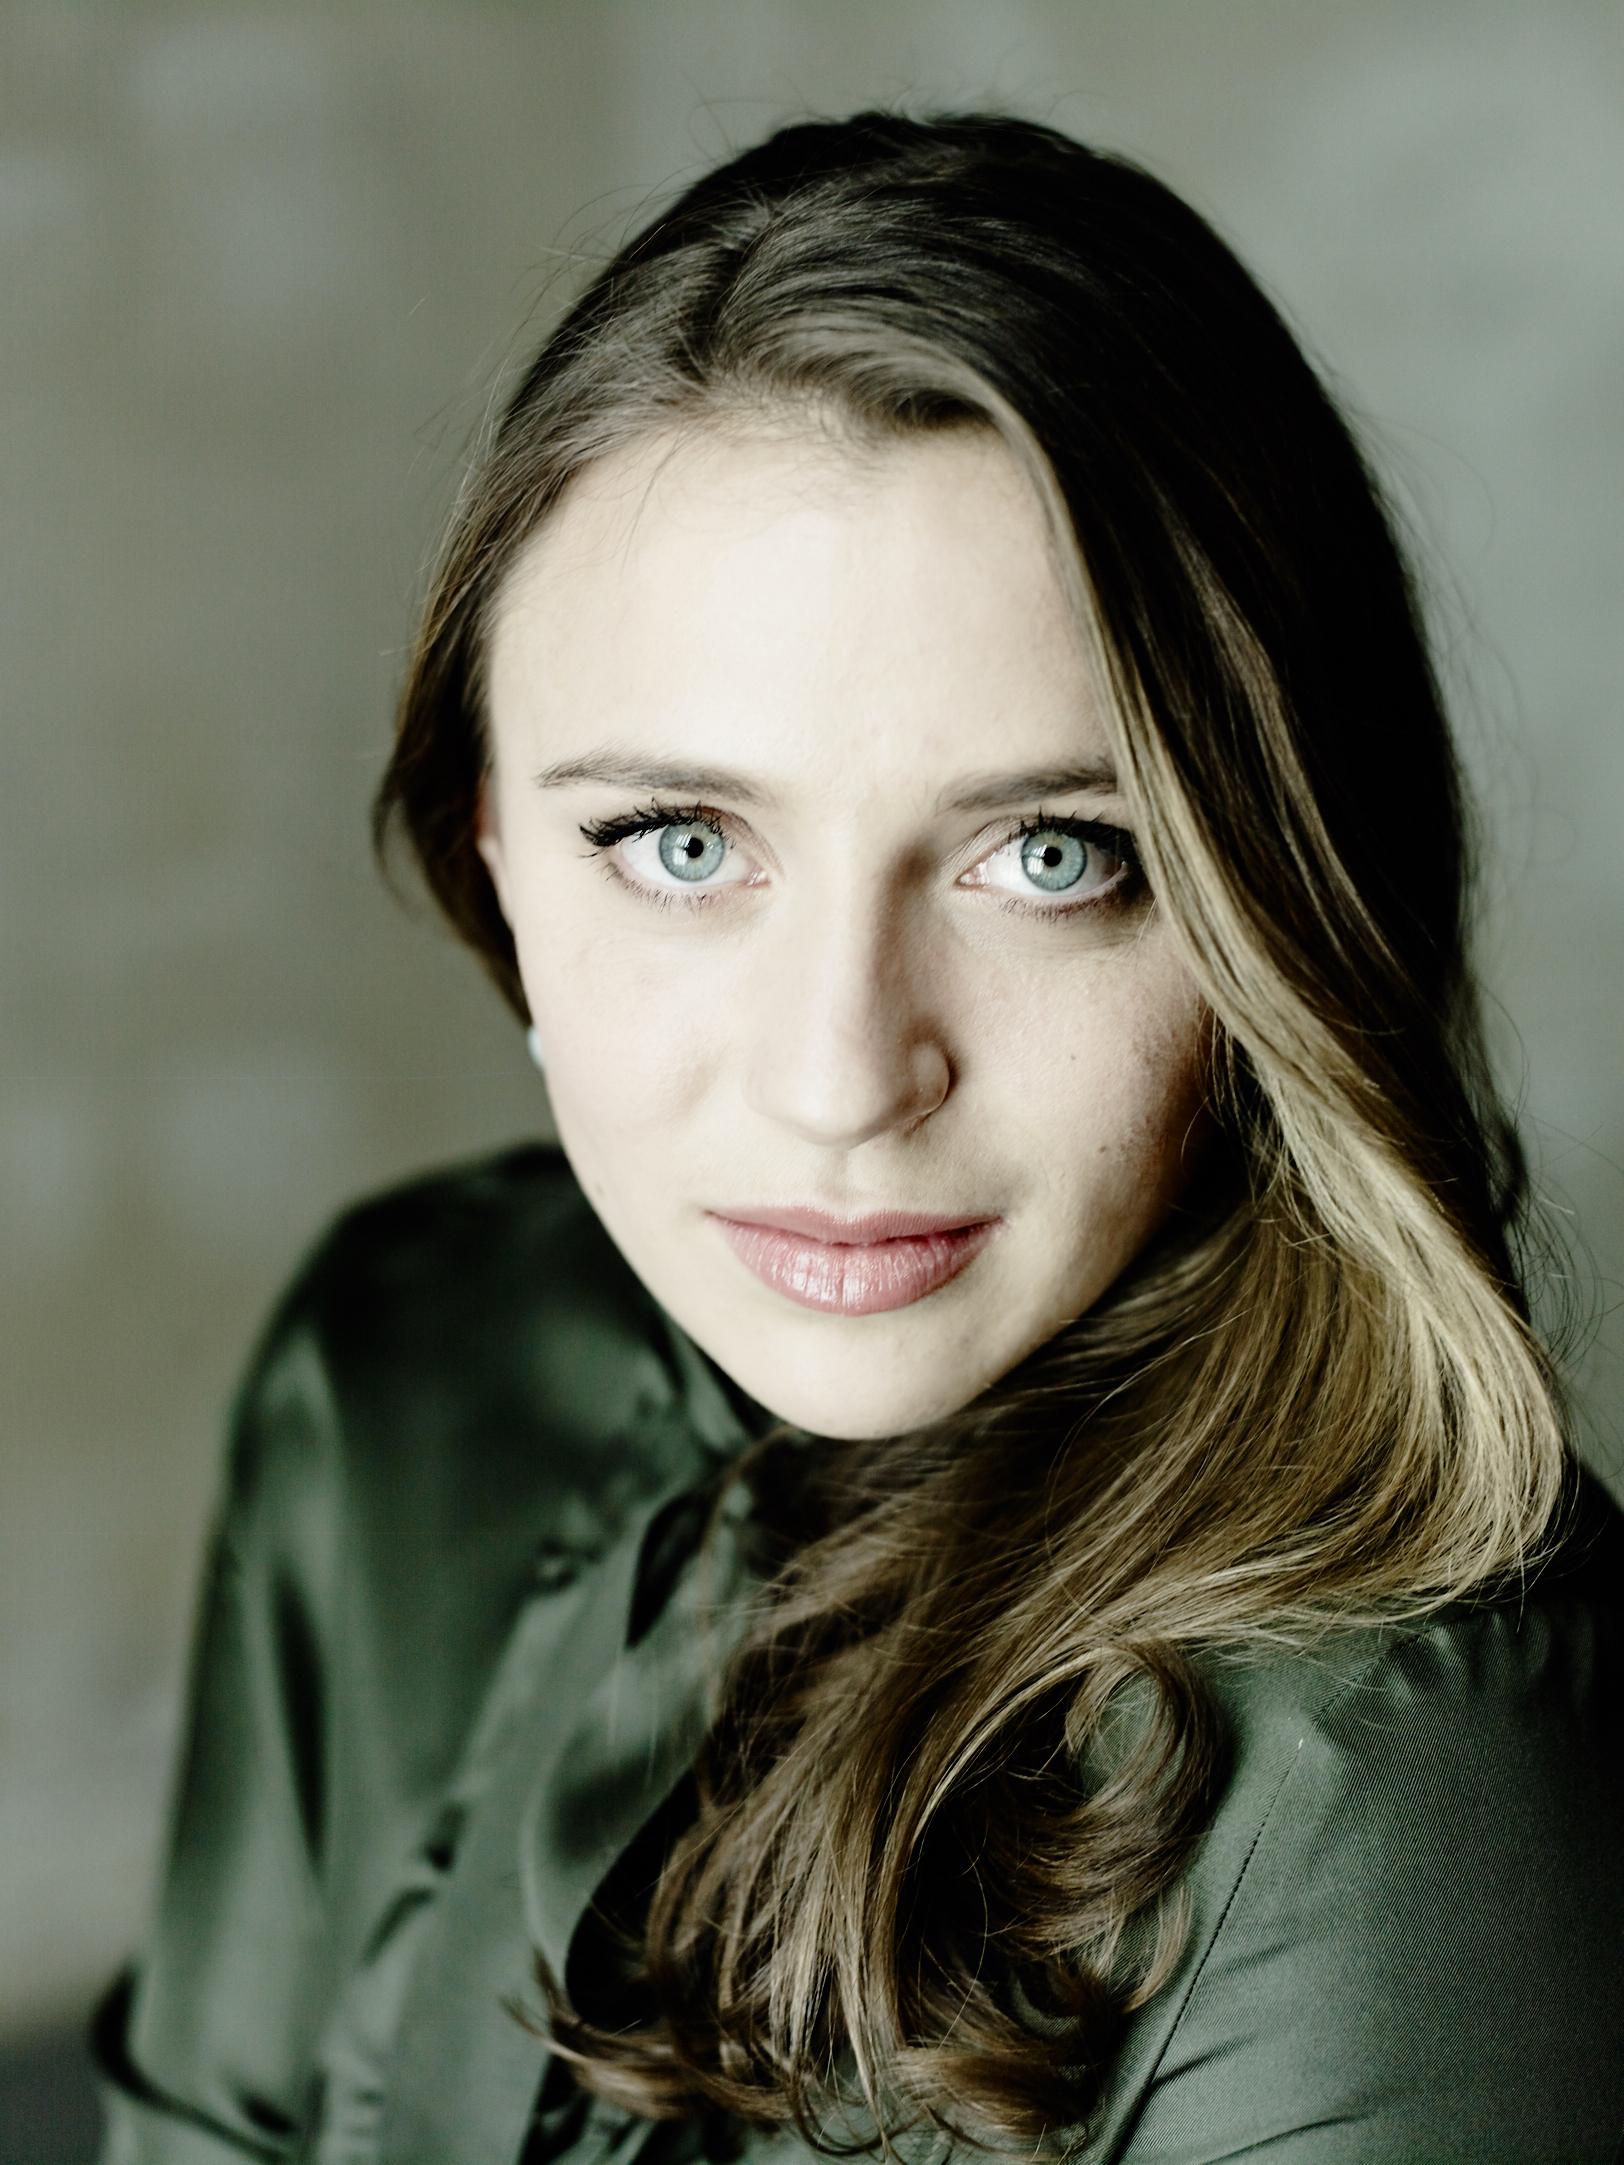 Esther Dierkes, portrait 2018 © Matthias Baus